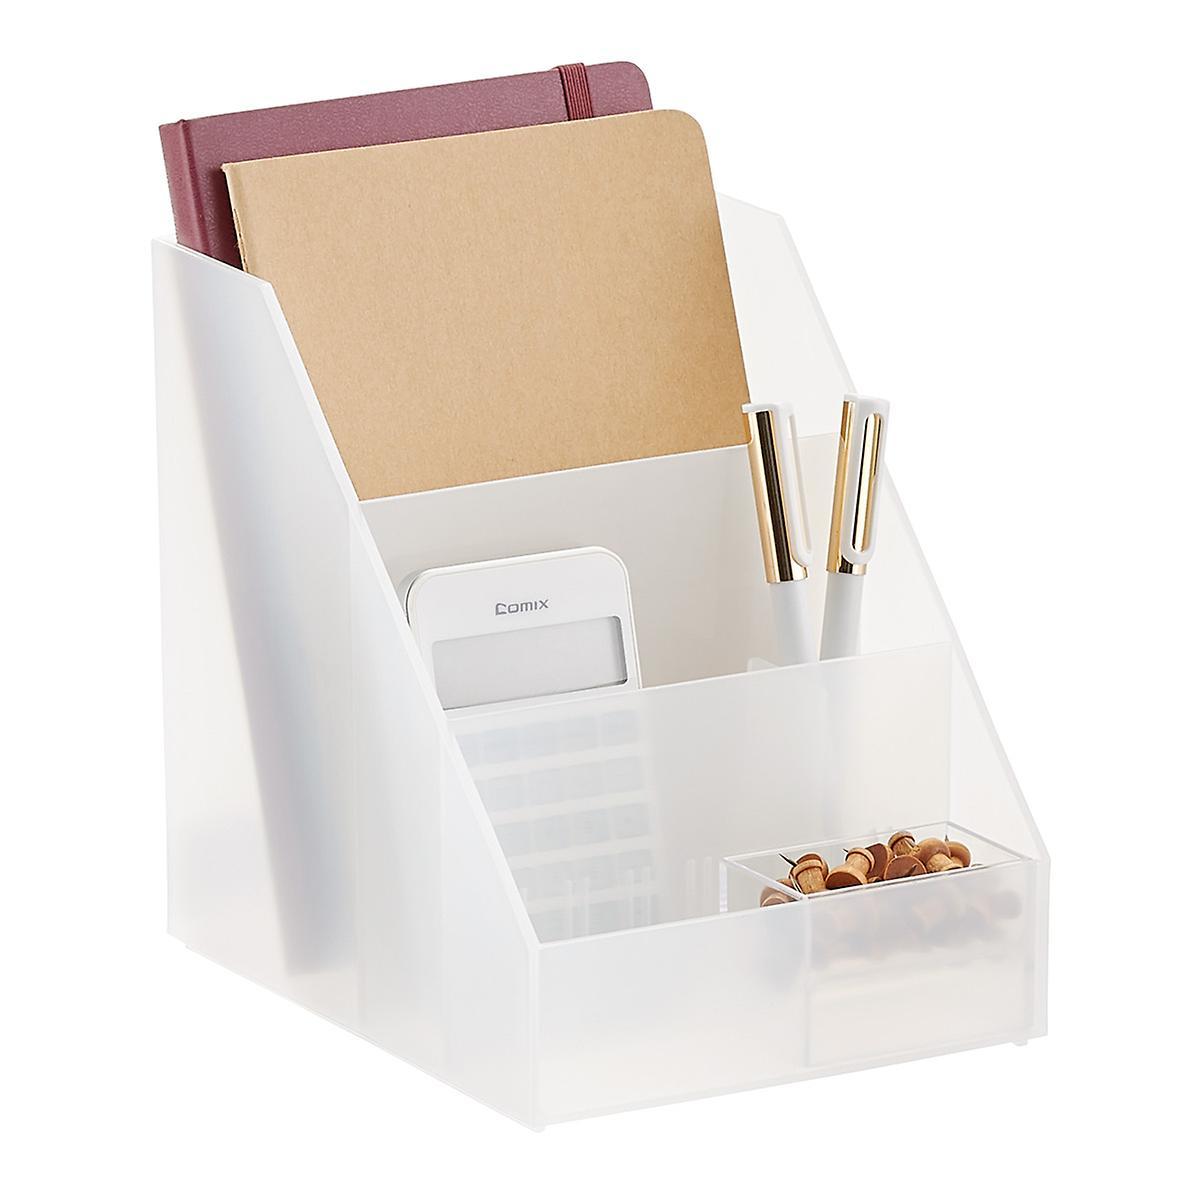 Small Desktop Station